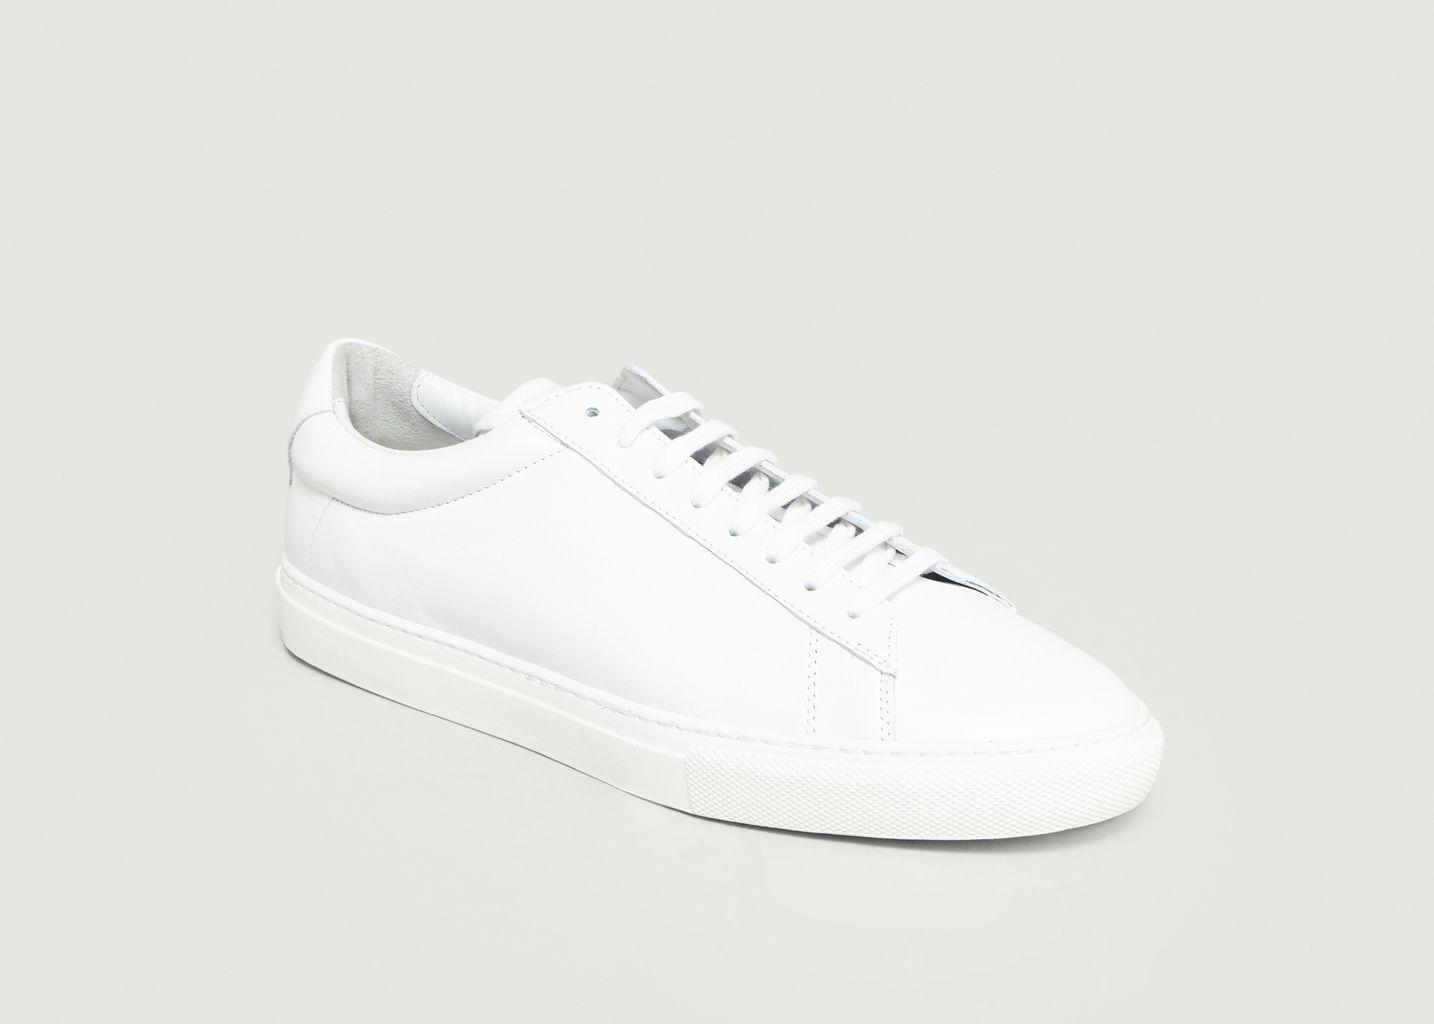 Sneakers ZSP4 Apla Nappa - Zespa